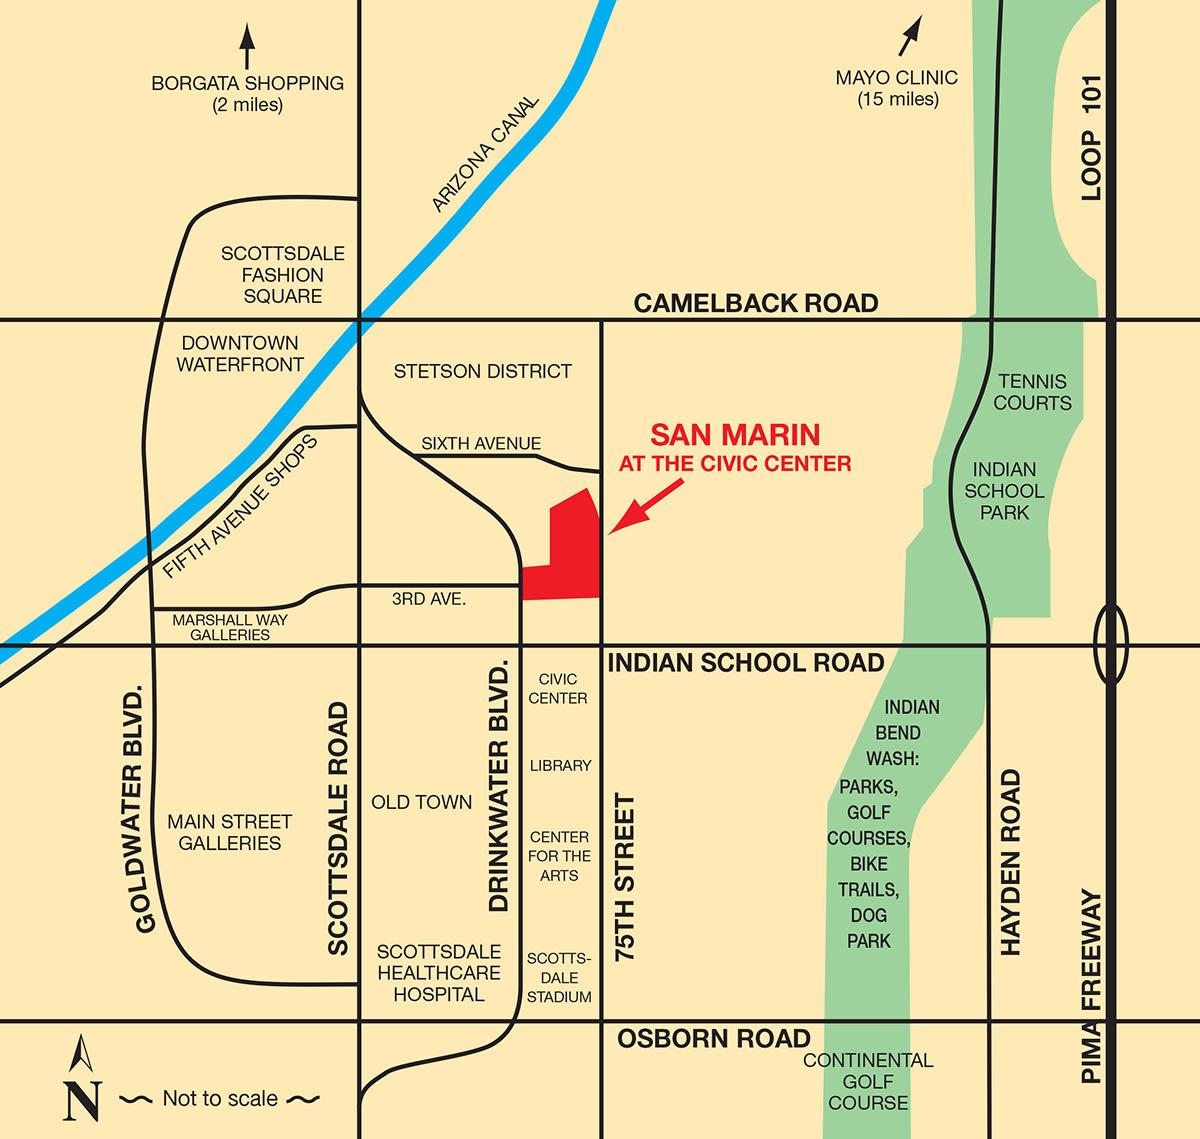 Map of San Marin at the Civic Center